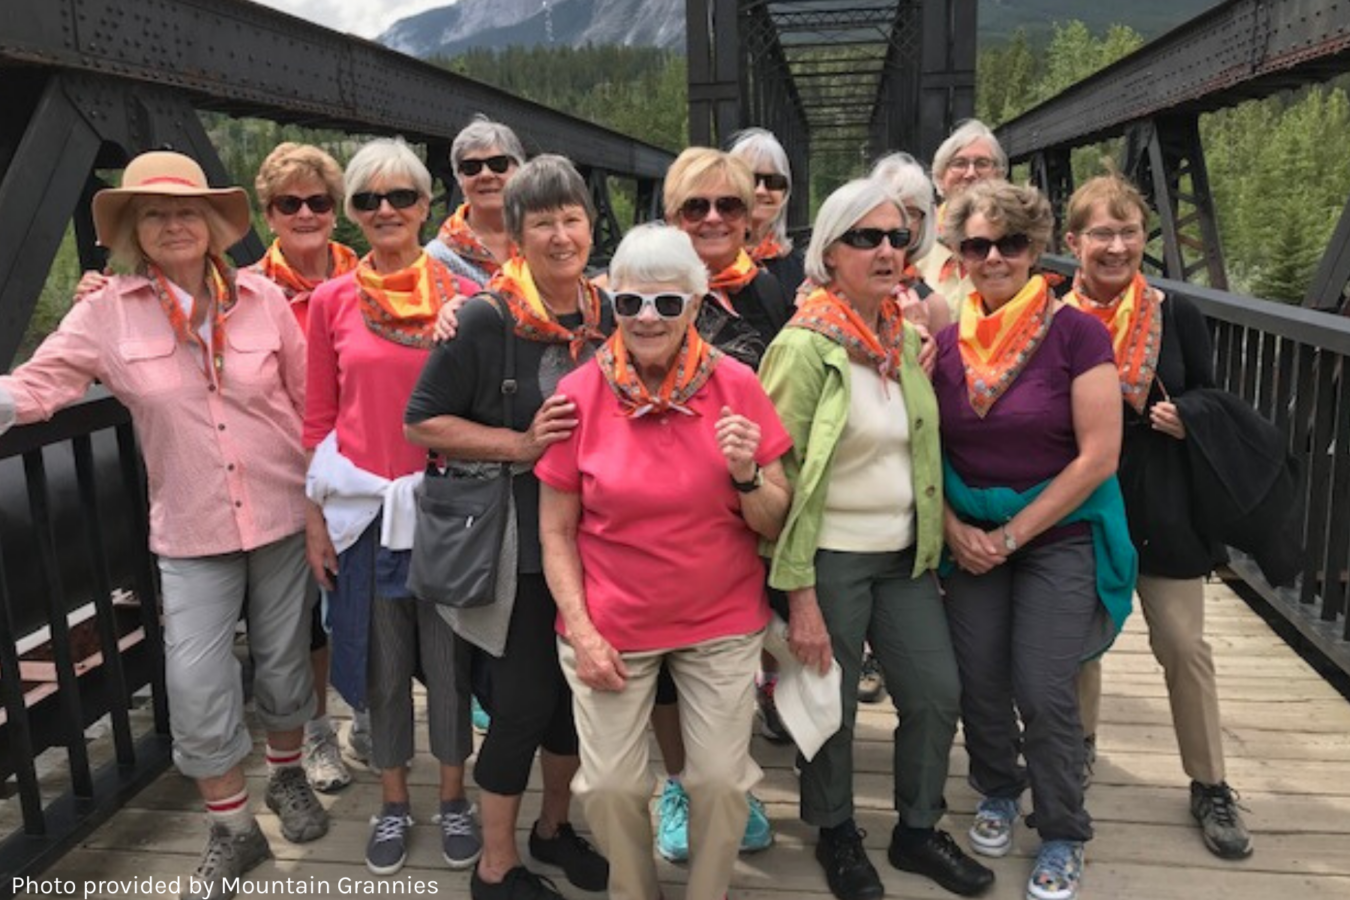 Mountain Grannies